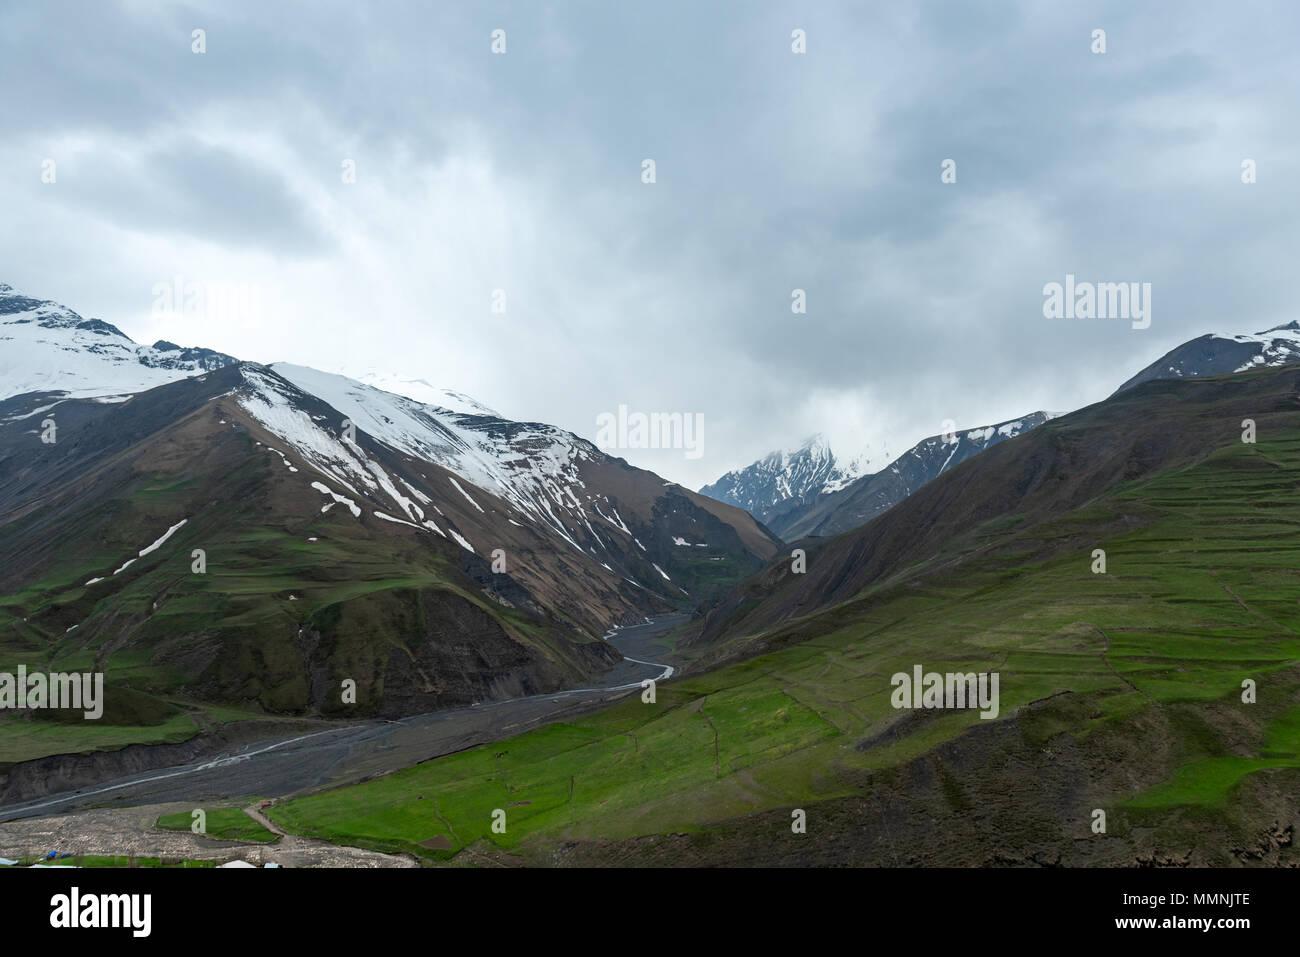 Highlands, beautiful high mountains - Stock Image